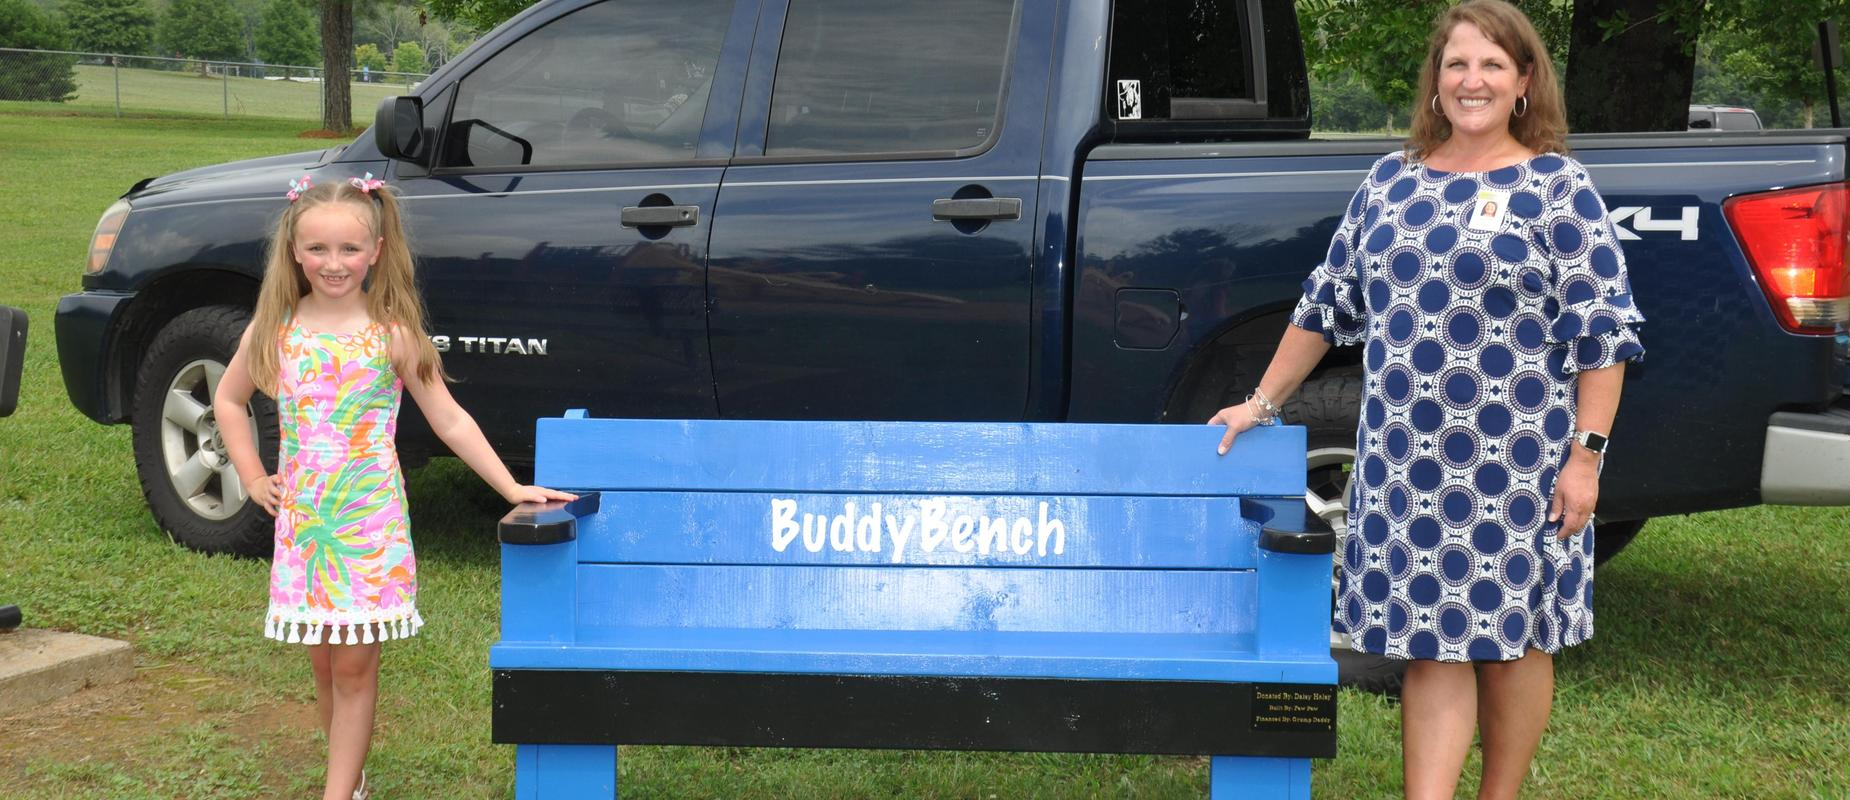 Daisy Donates Buddy Benches to WES